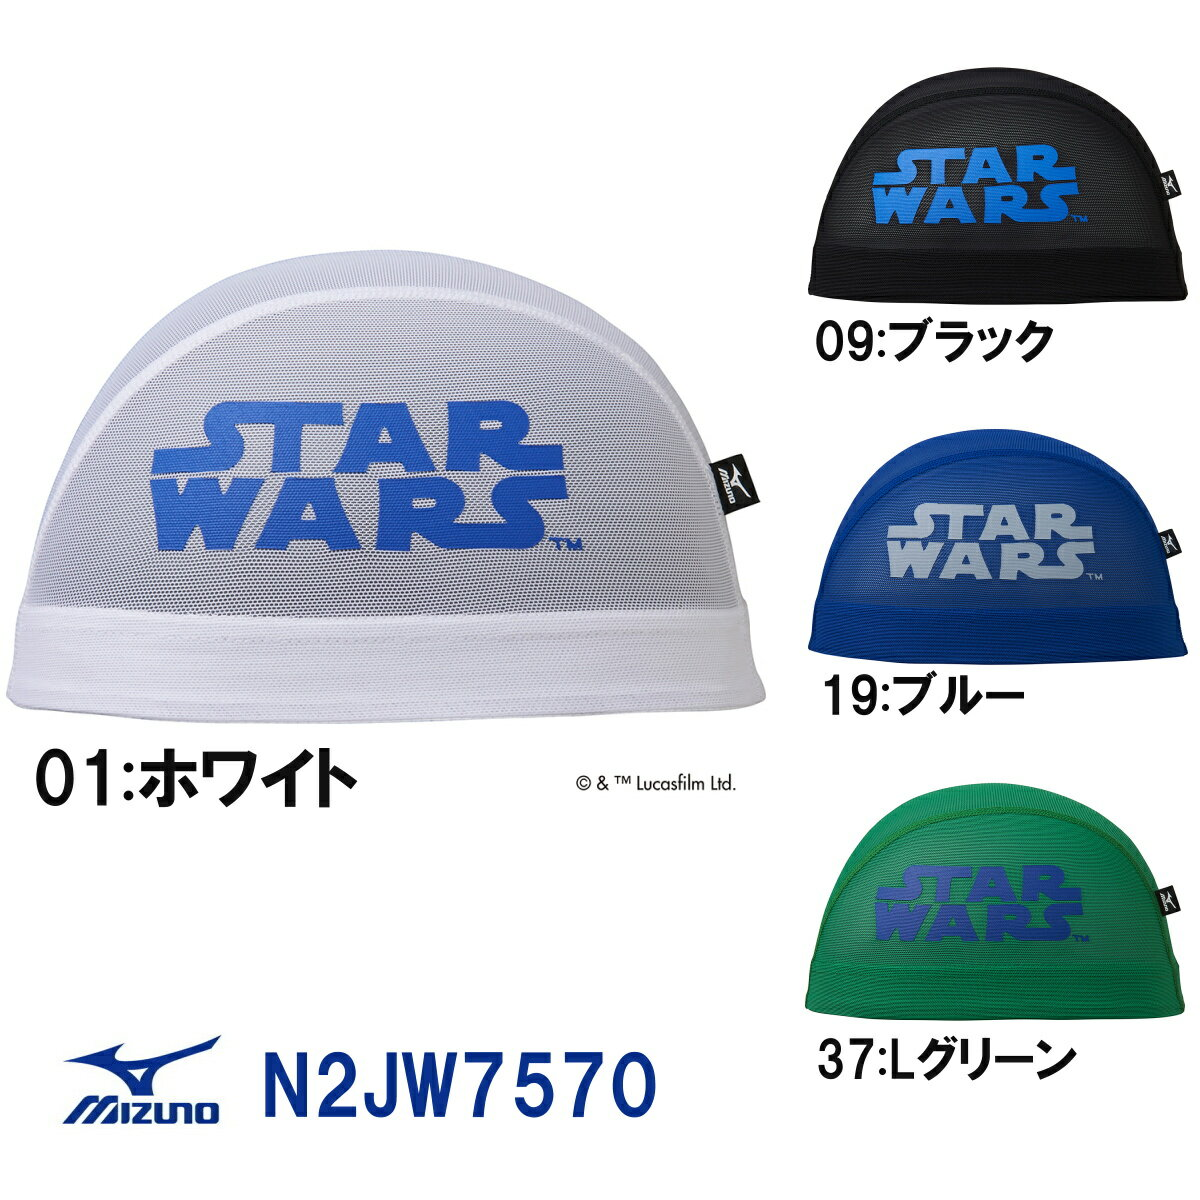 MIZUNO ミズノ メッシュキャップ Star Wars 2017年AW展示会受注生産モデル N2JW7570-HK